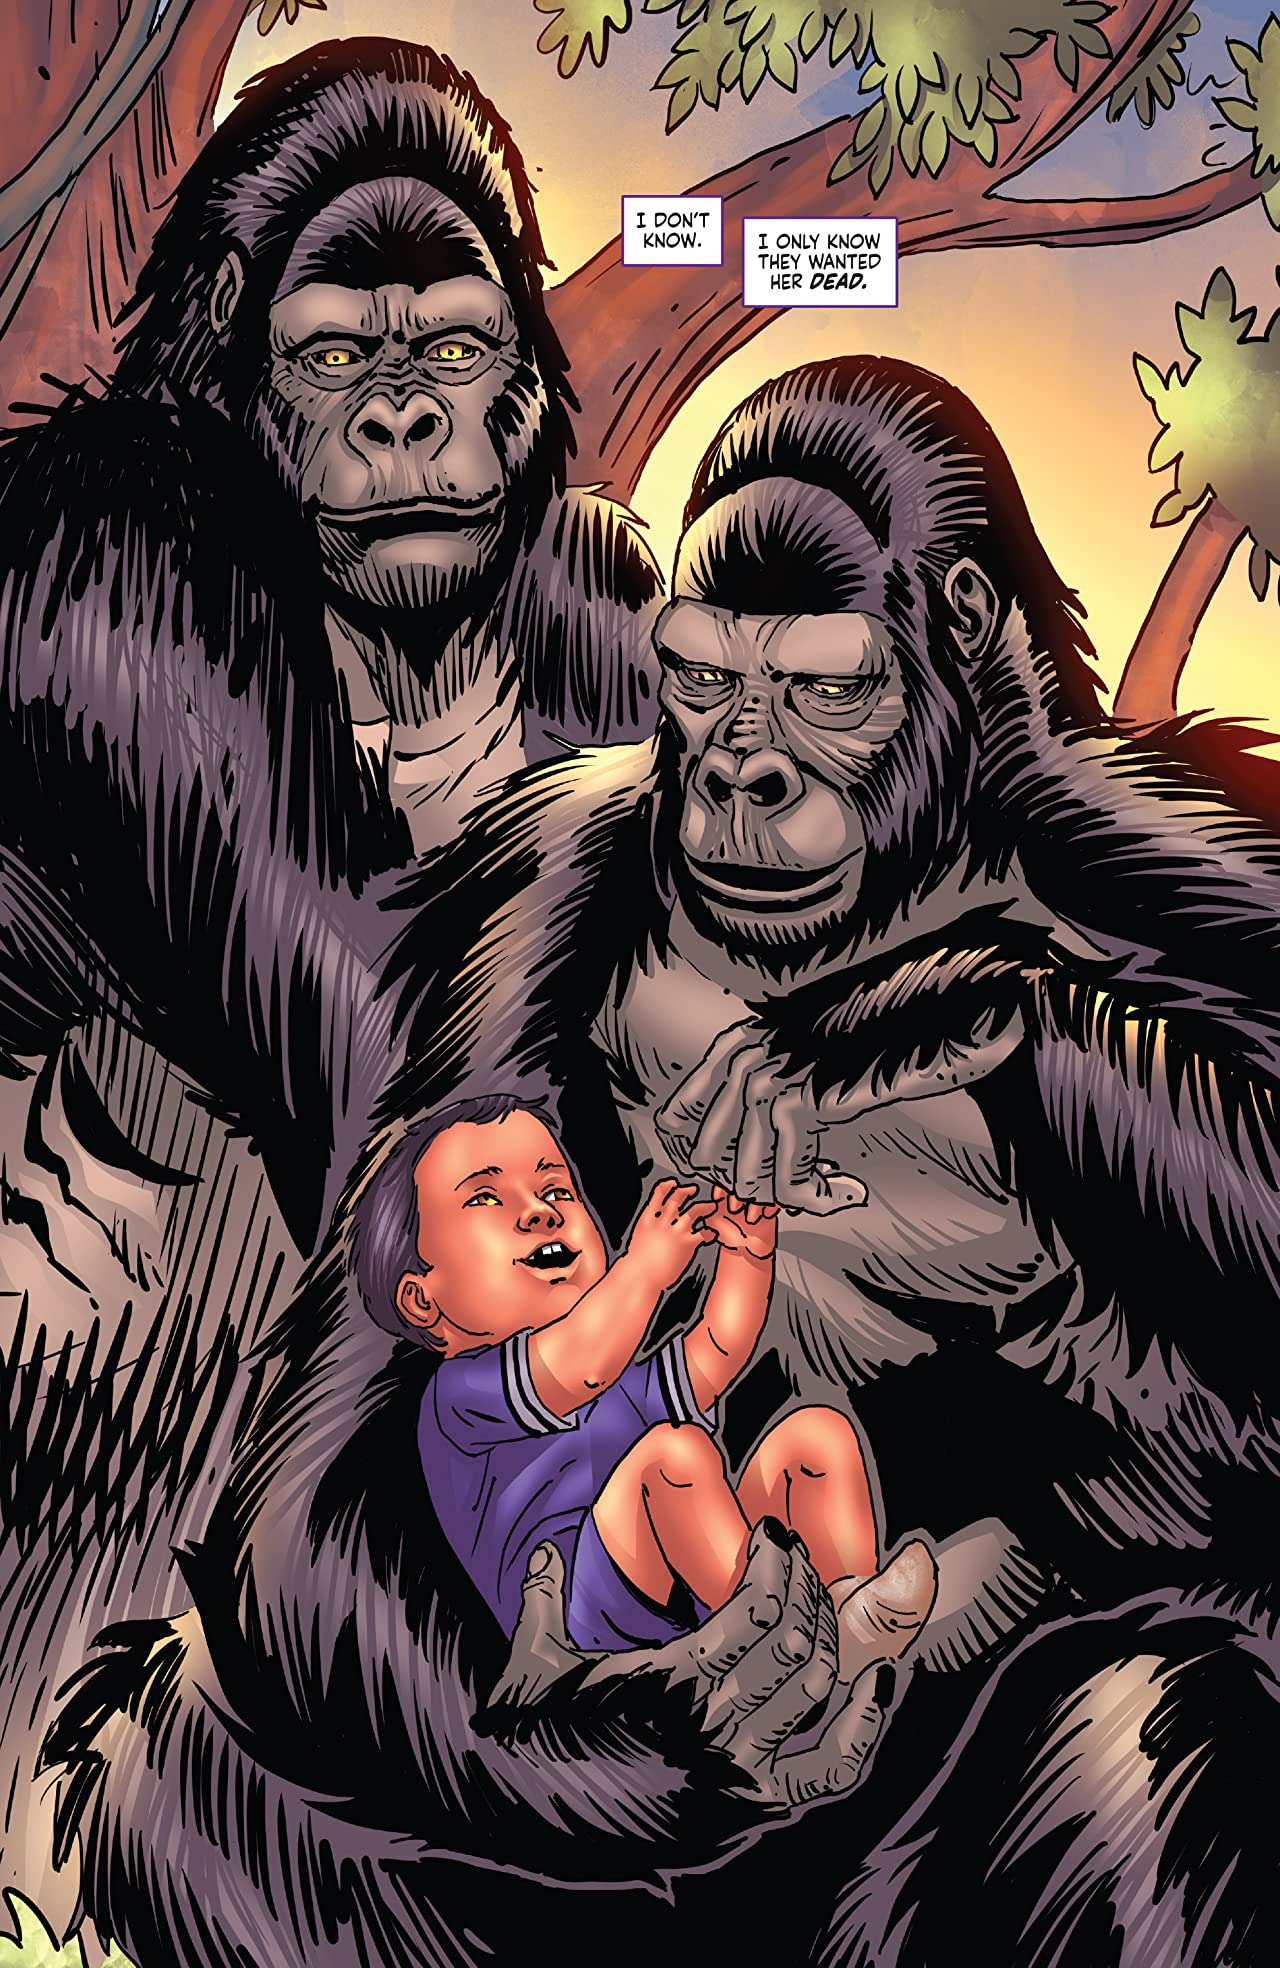 Red Sonja/Tarzan #4